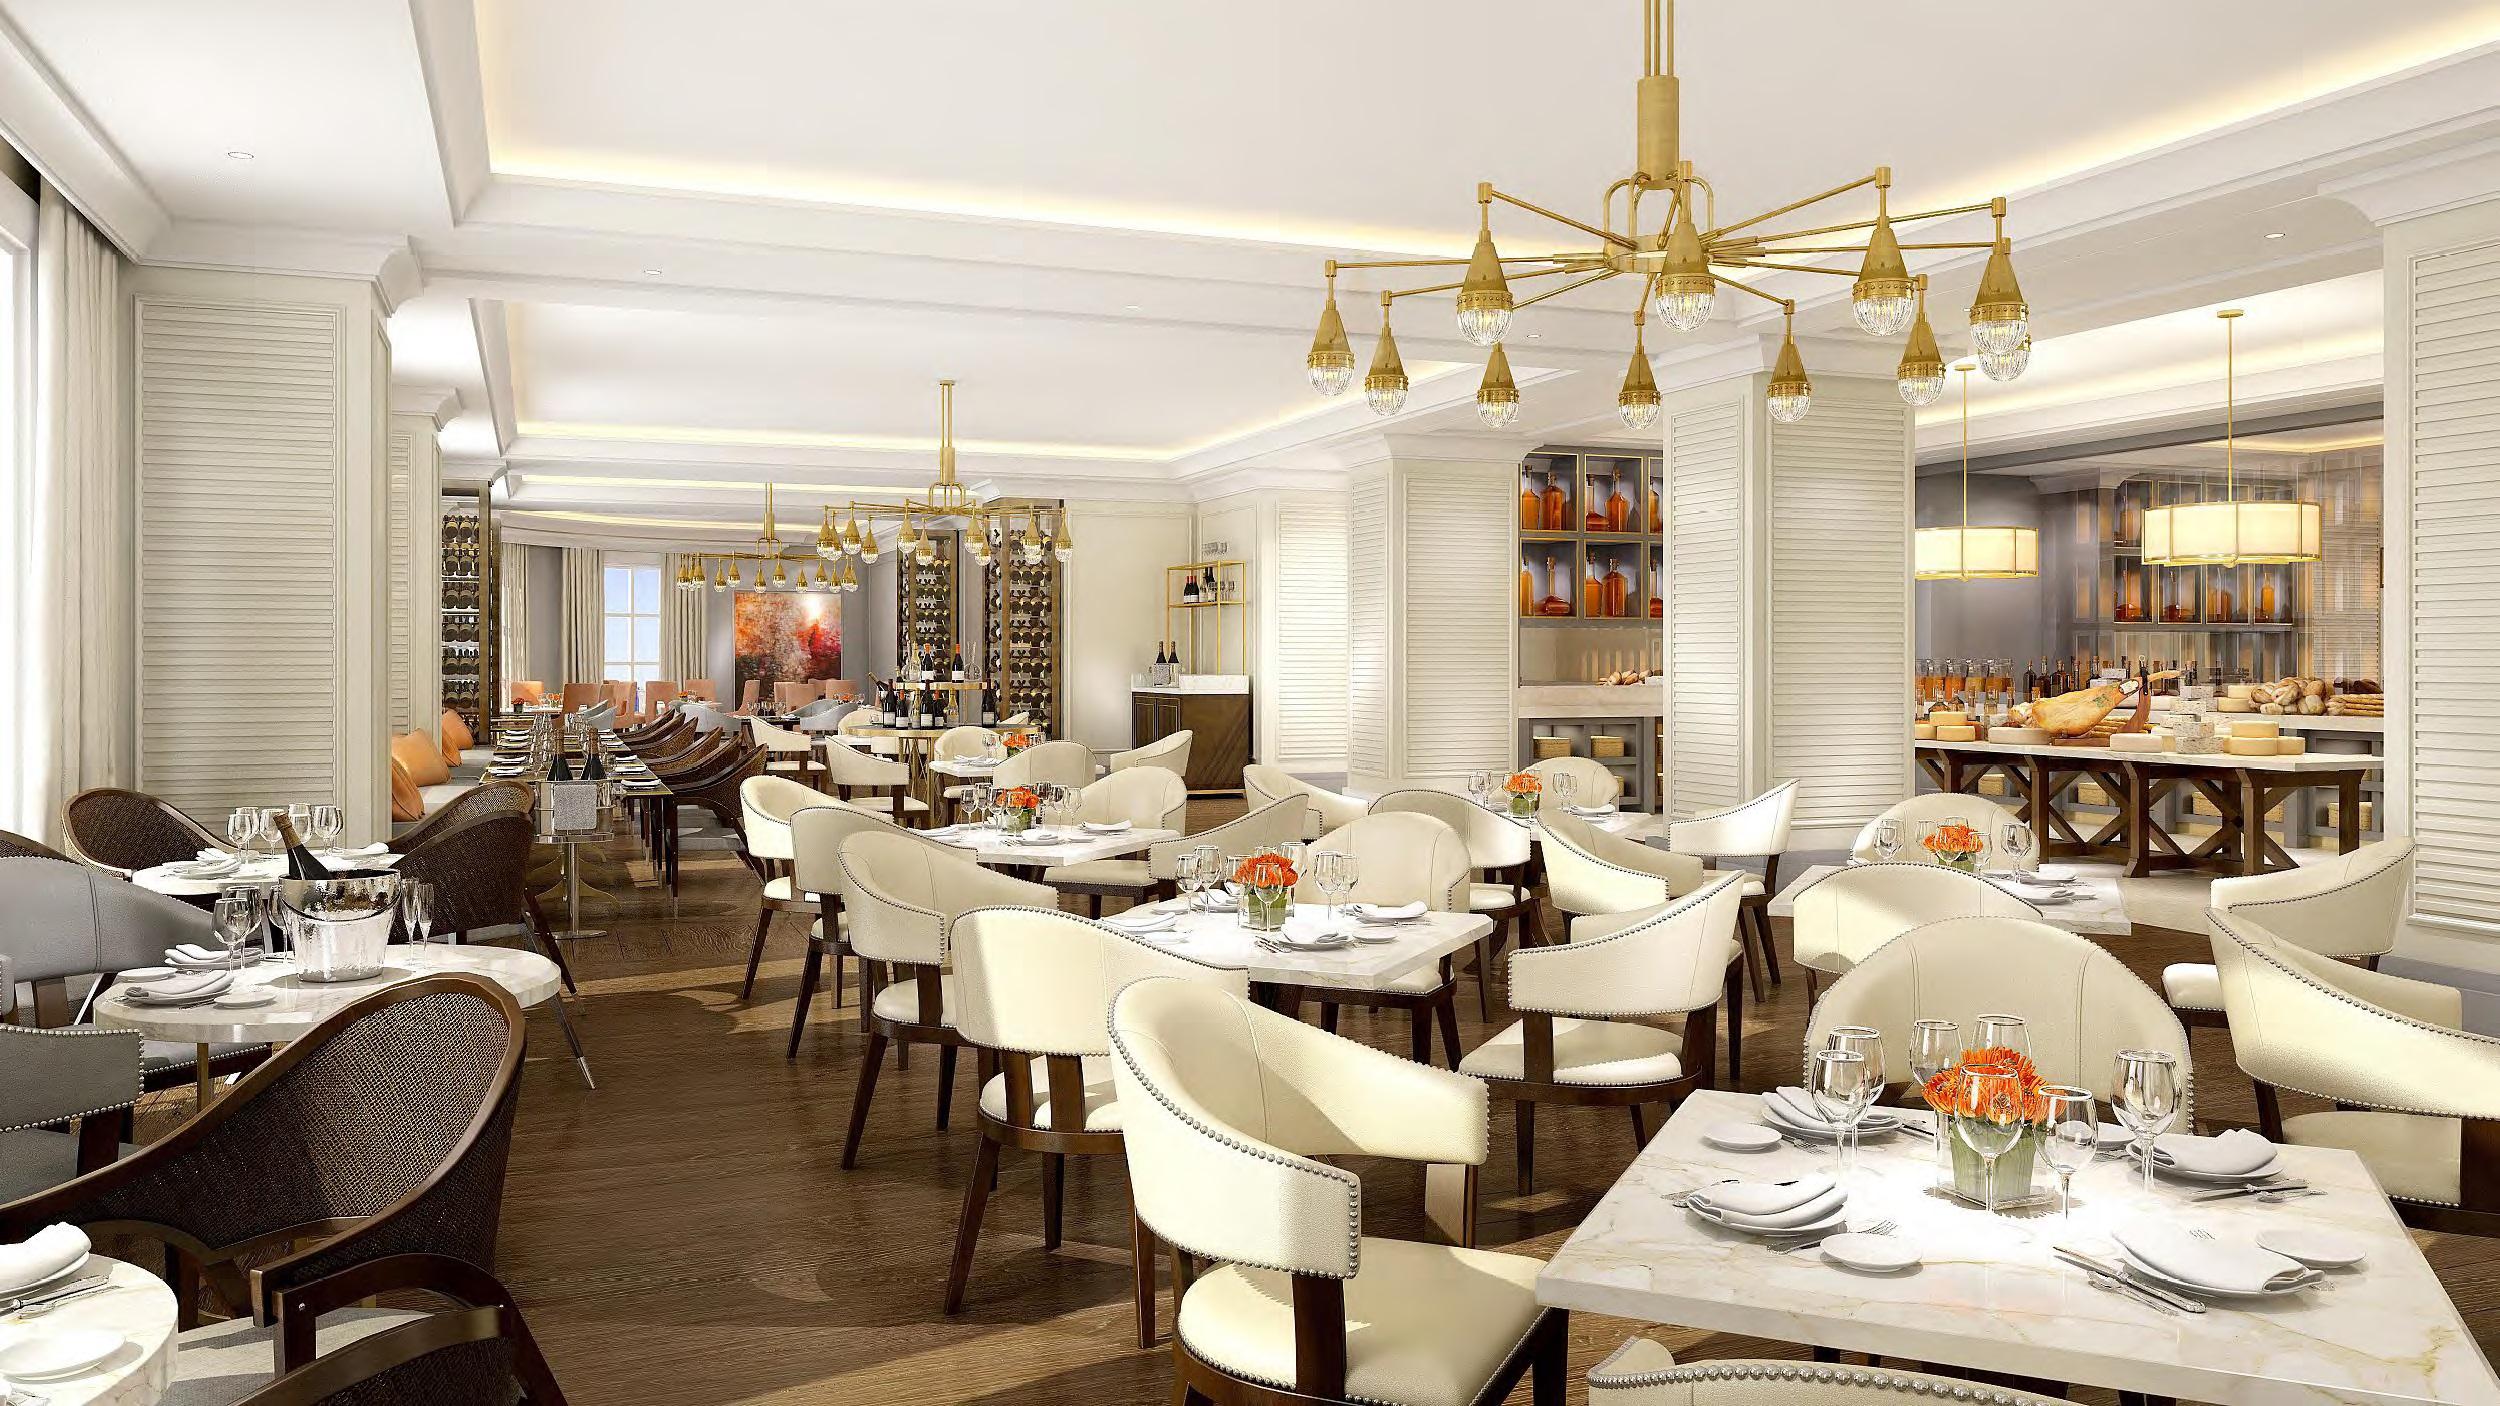 The langham sydney to redefine elegance with 30 million for Kitchen design jobs sydney